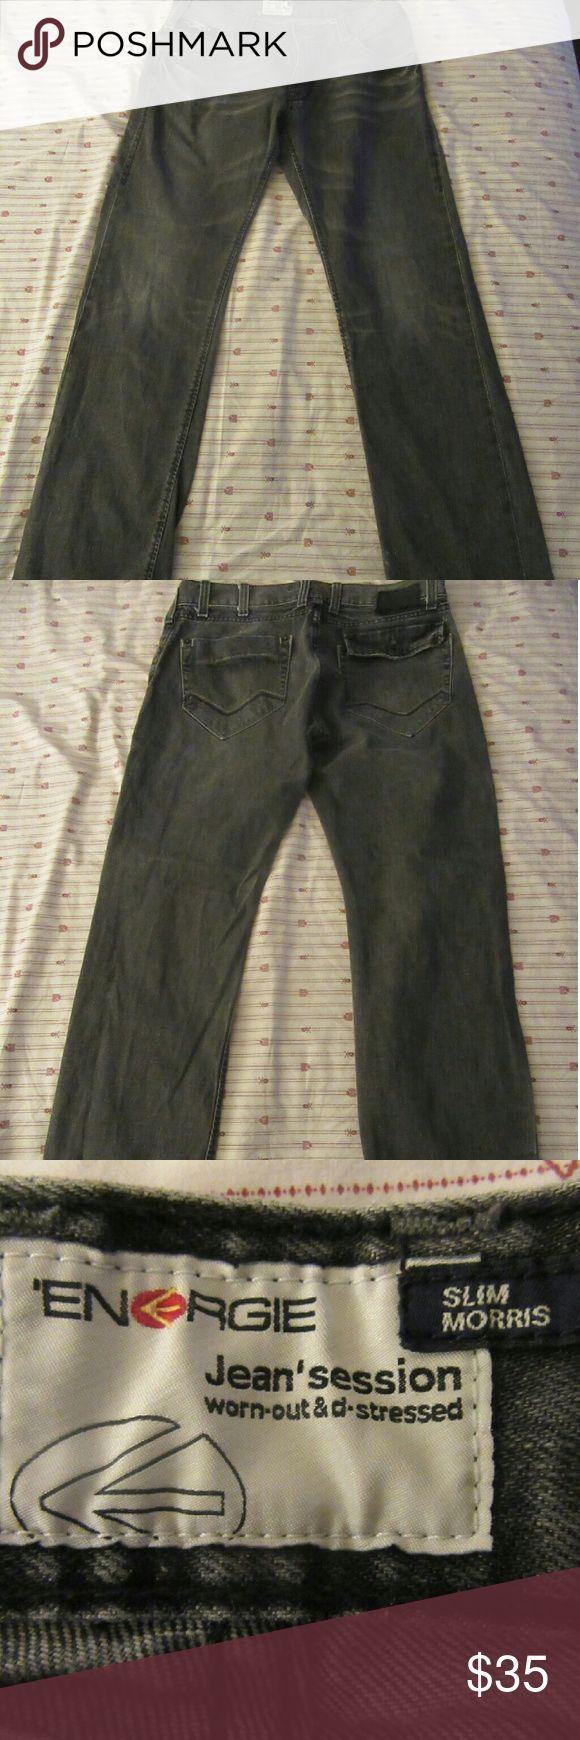 mens energie slim morris jeans 34x34 good shape  mens energie slim morris jeans 34x34 Energie Jeans Slim